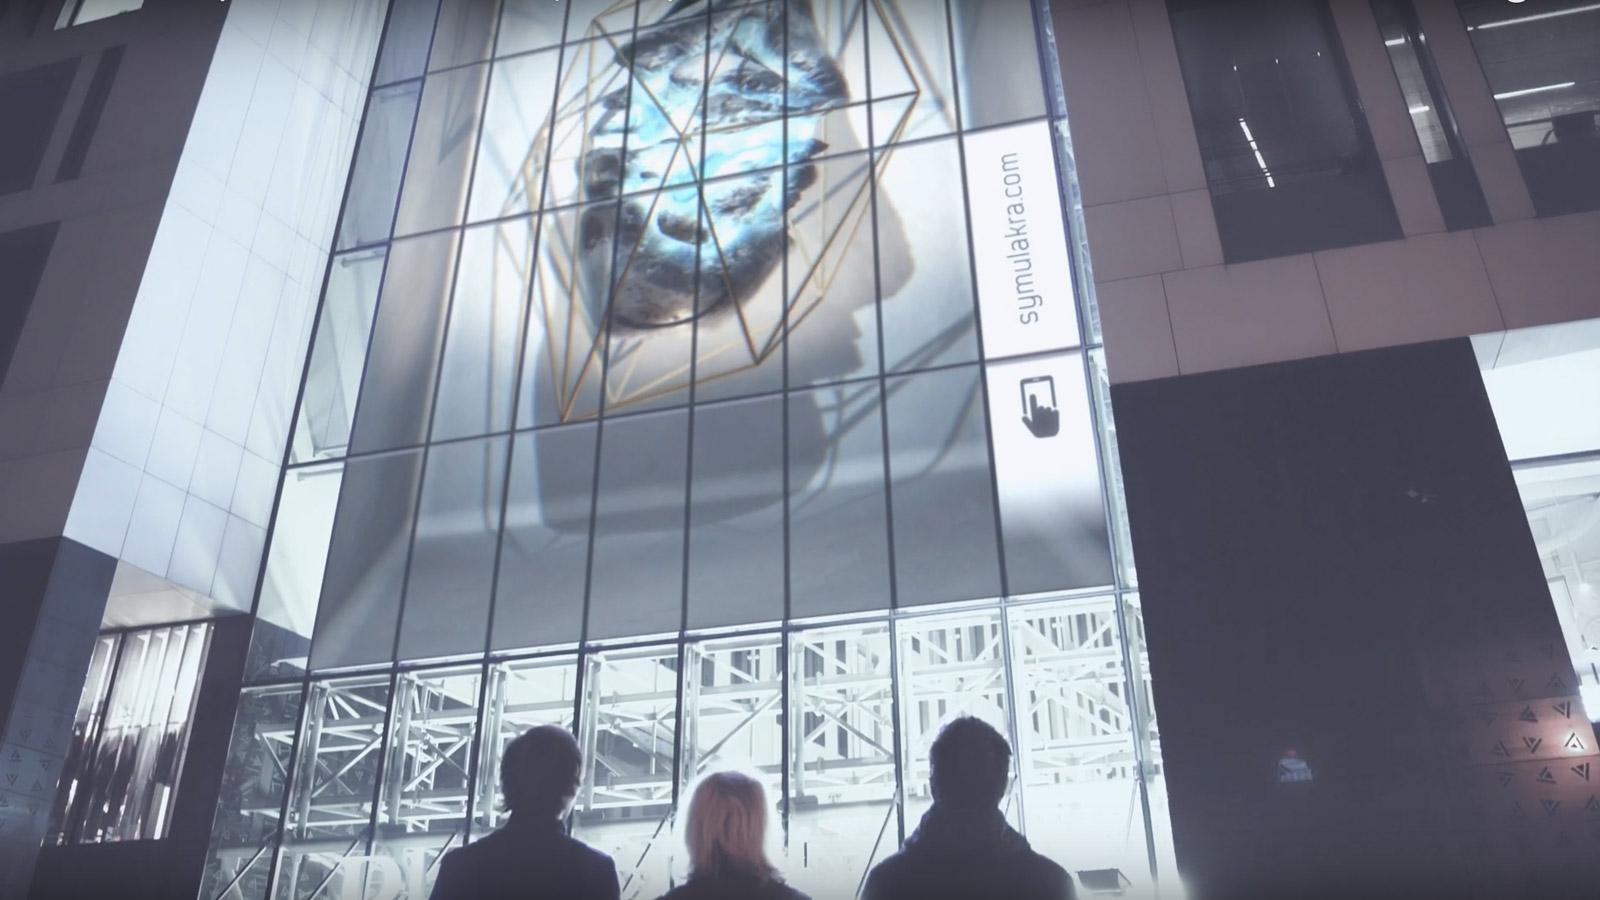 Sztuka w DOOH? Nowatorski projekt w Warszawie DOOH mediarun Symulakra sztuka 2019